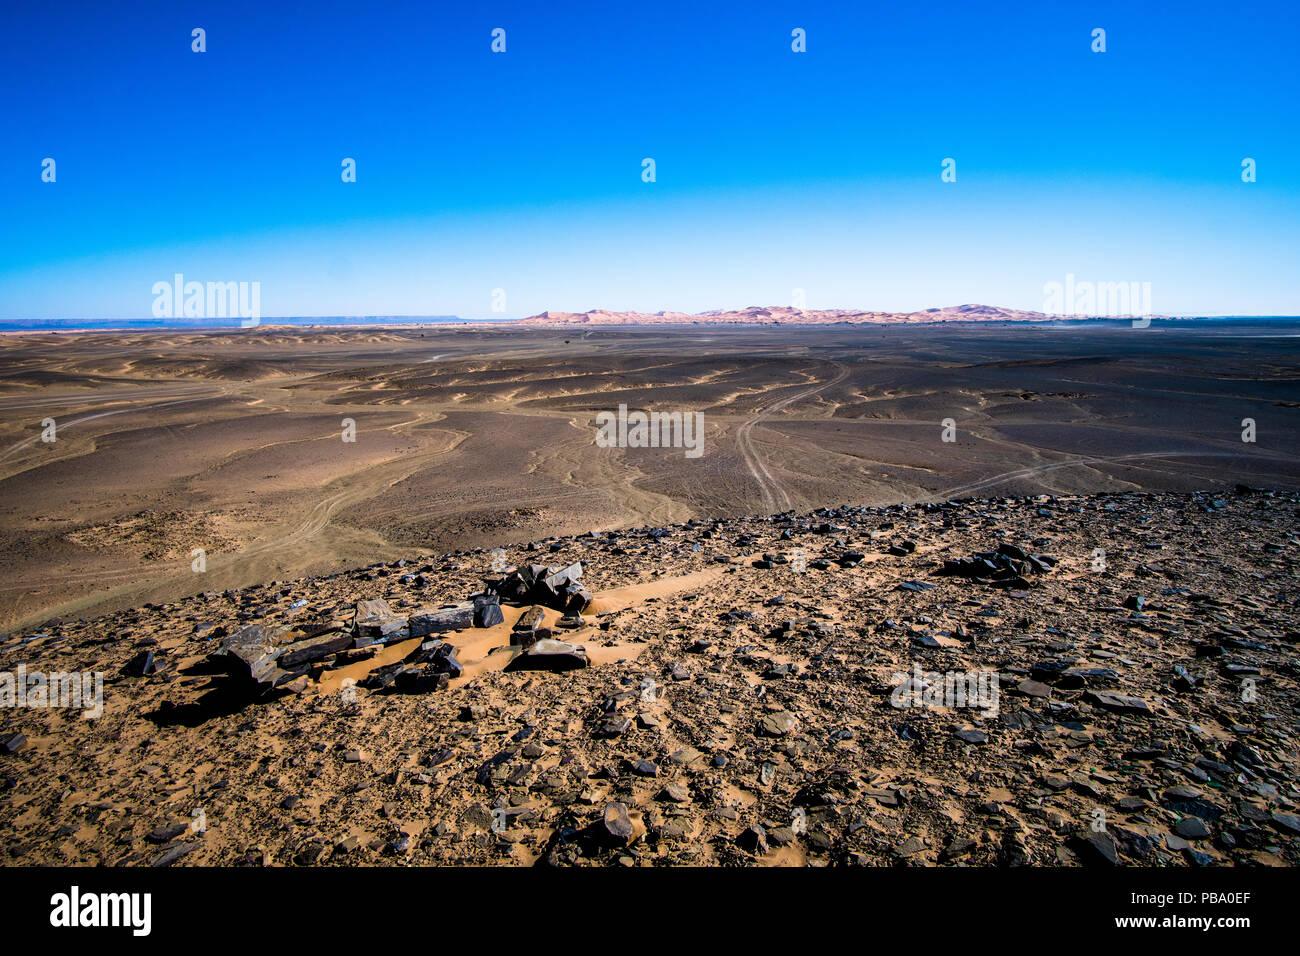 Volcanic black basalt terrain in Sahara desert in Morocco - Stock Image